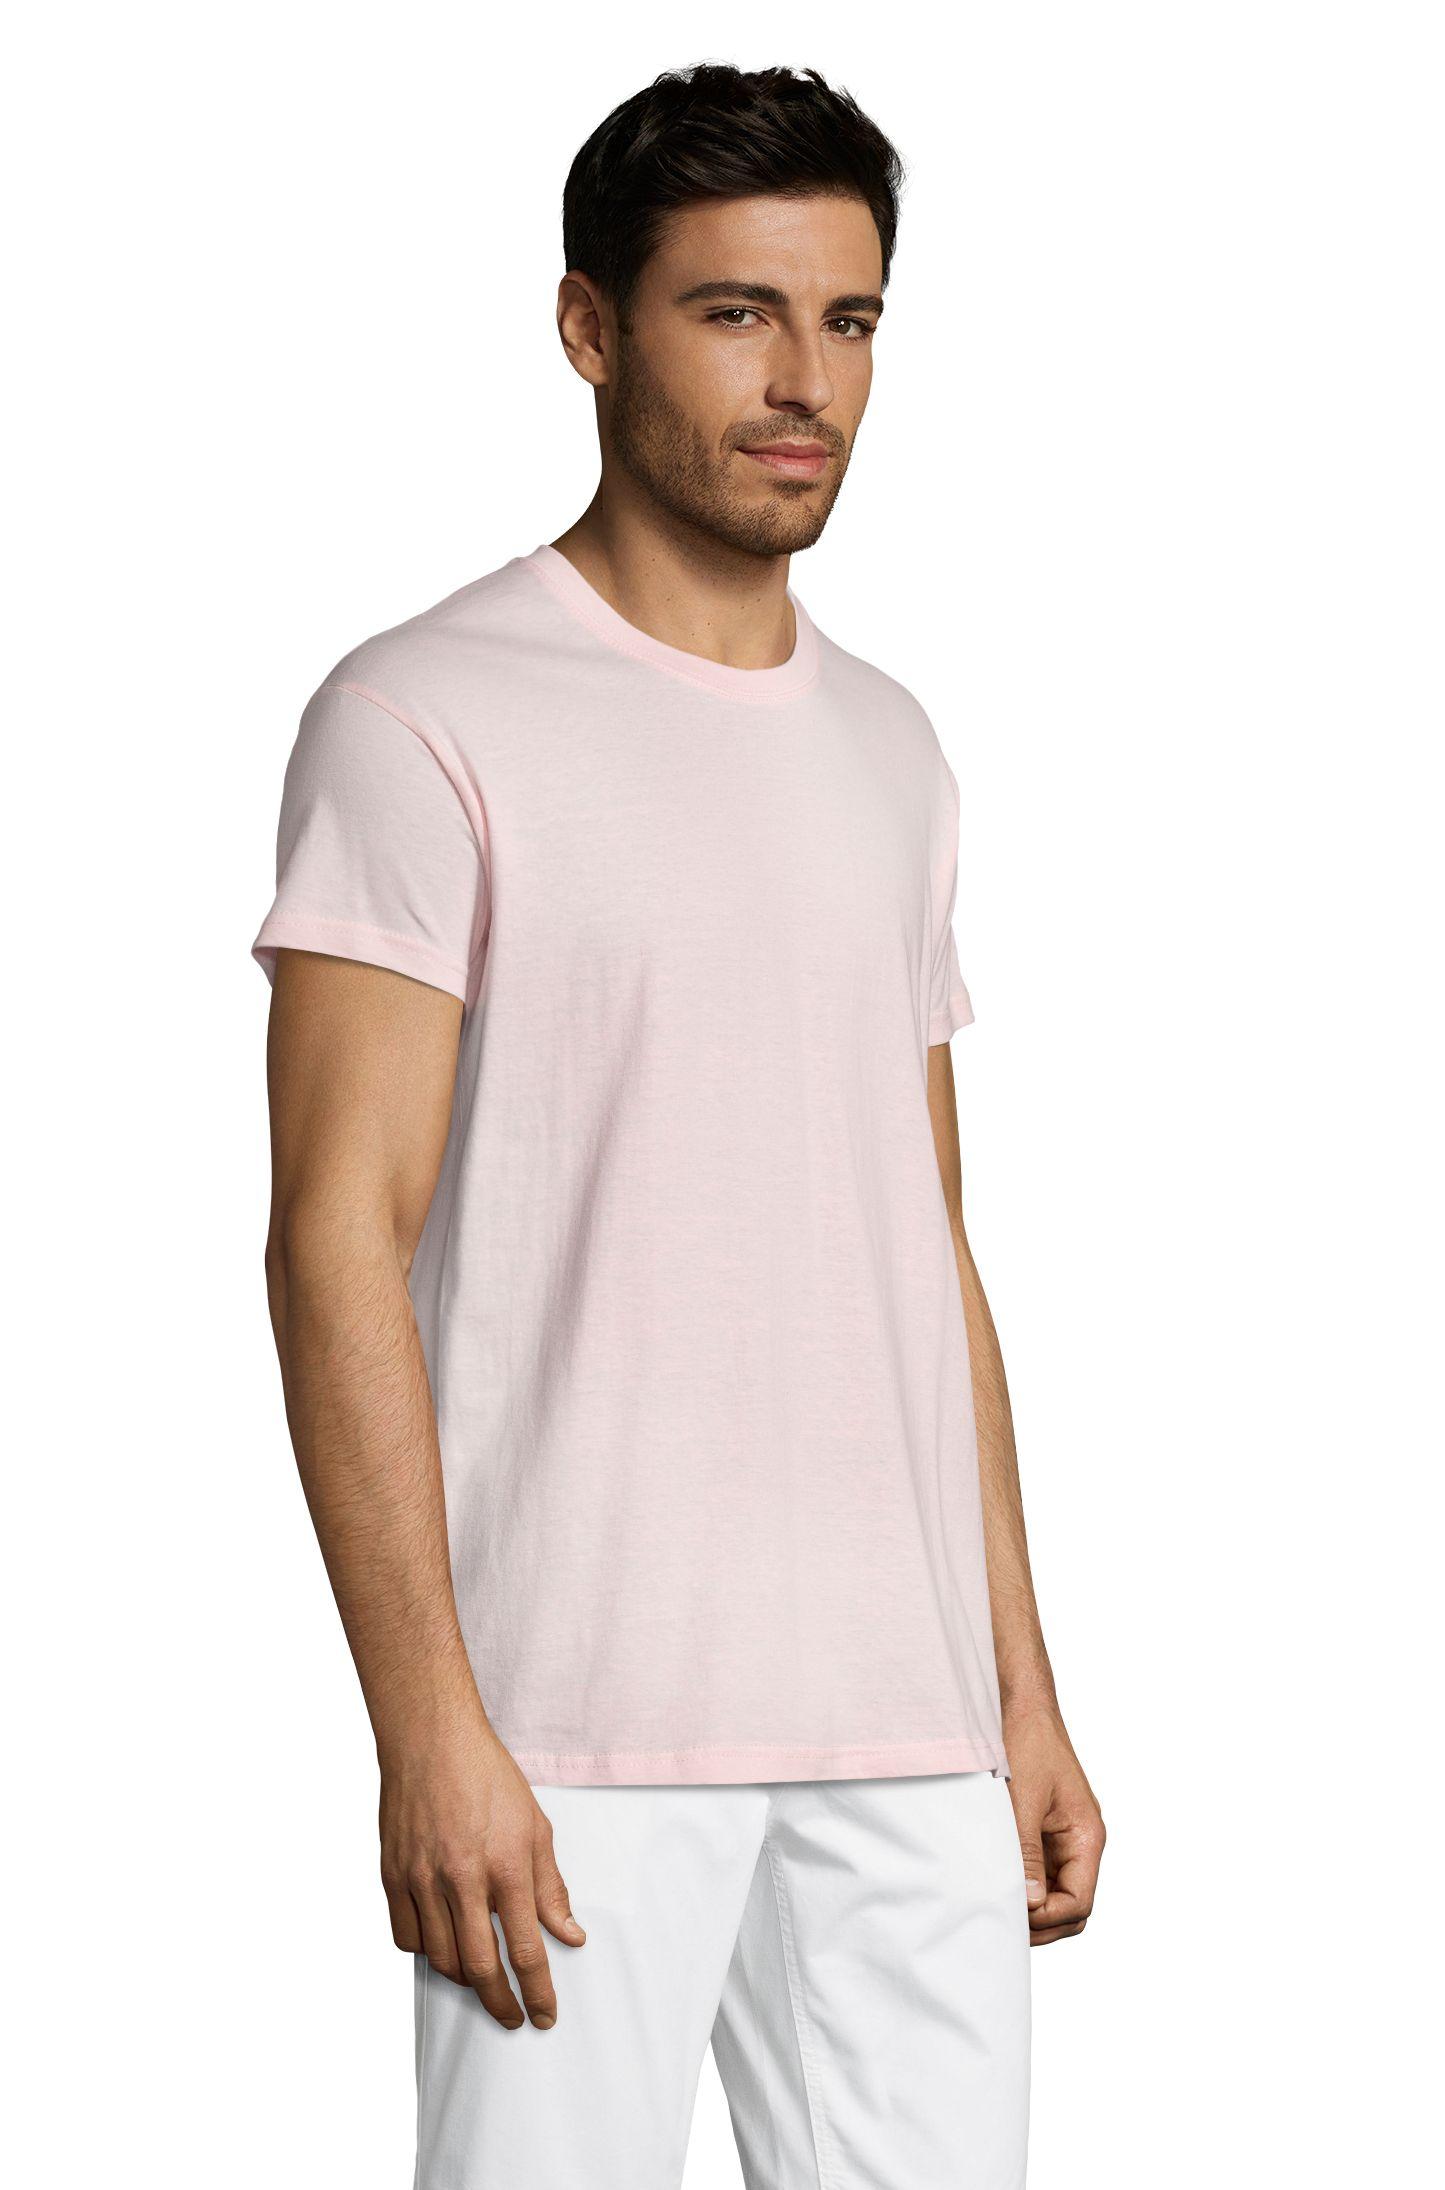 137 - Medium pink